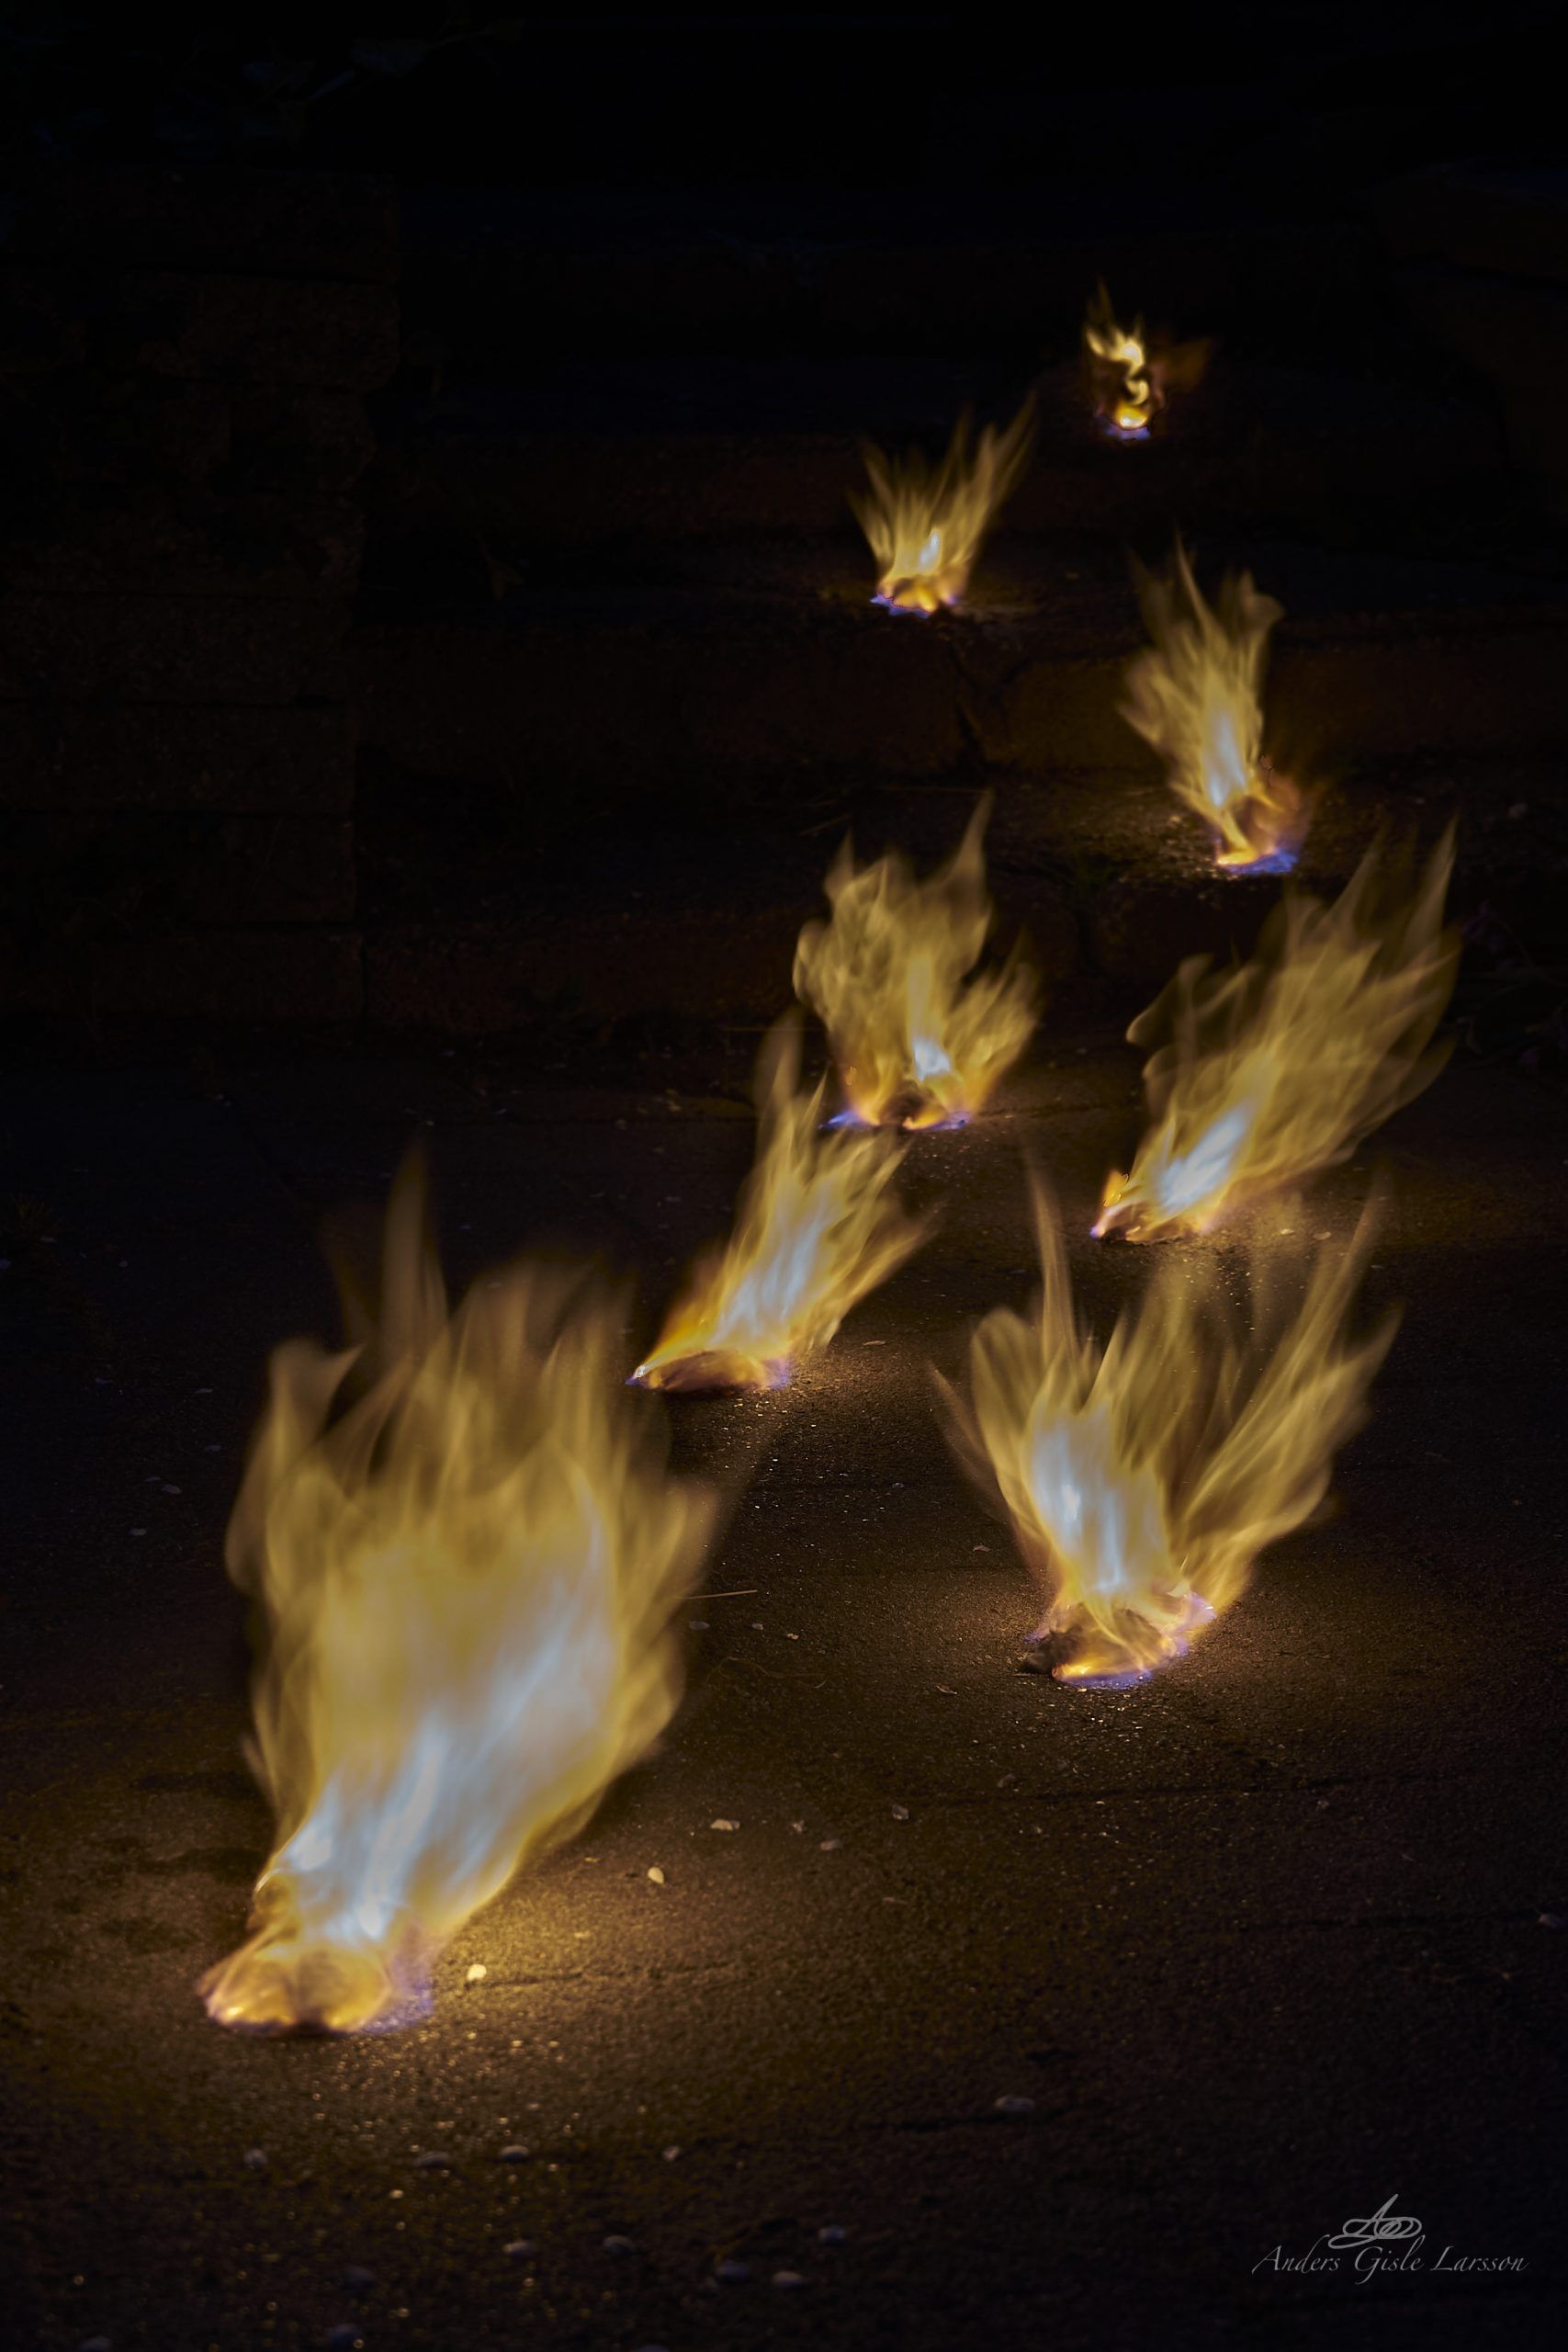 258/365, Fire Walk with me, Assentoft, Randers